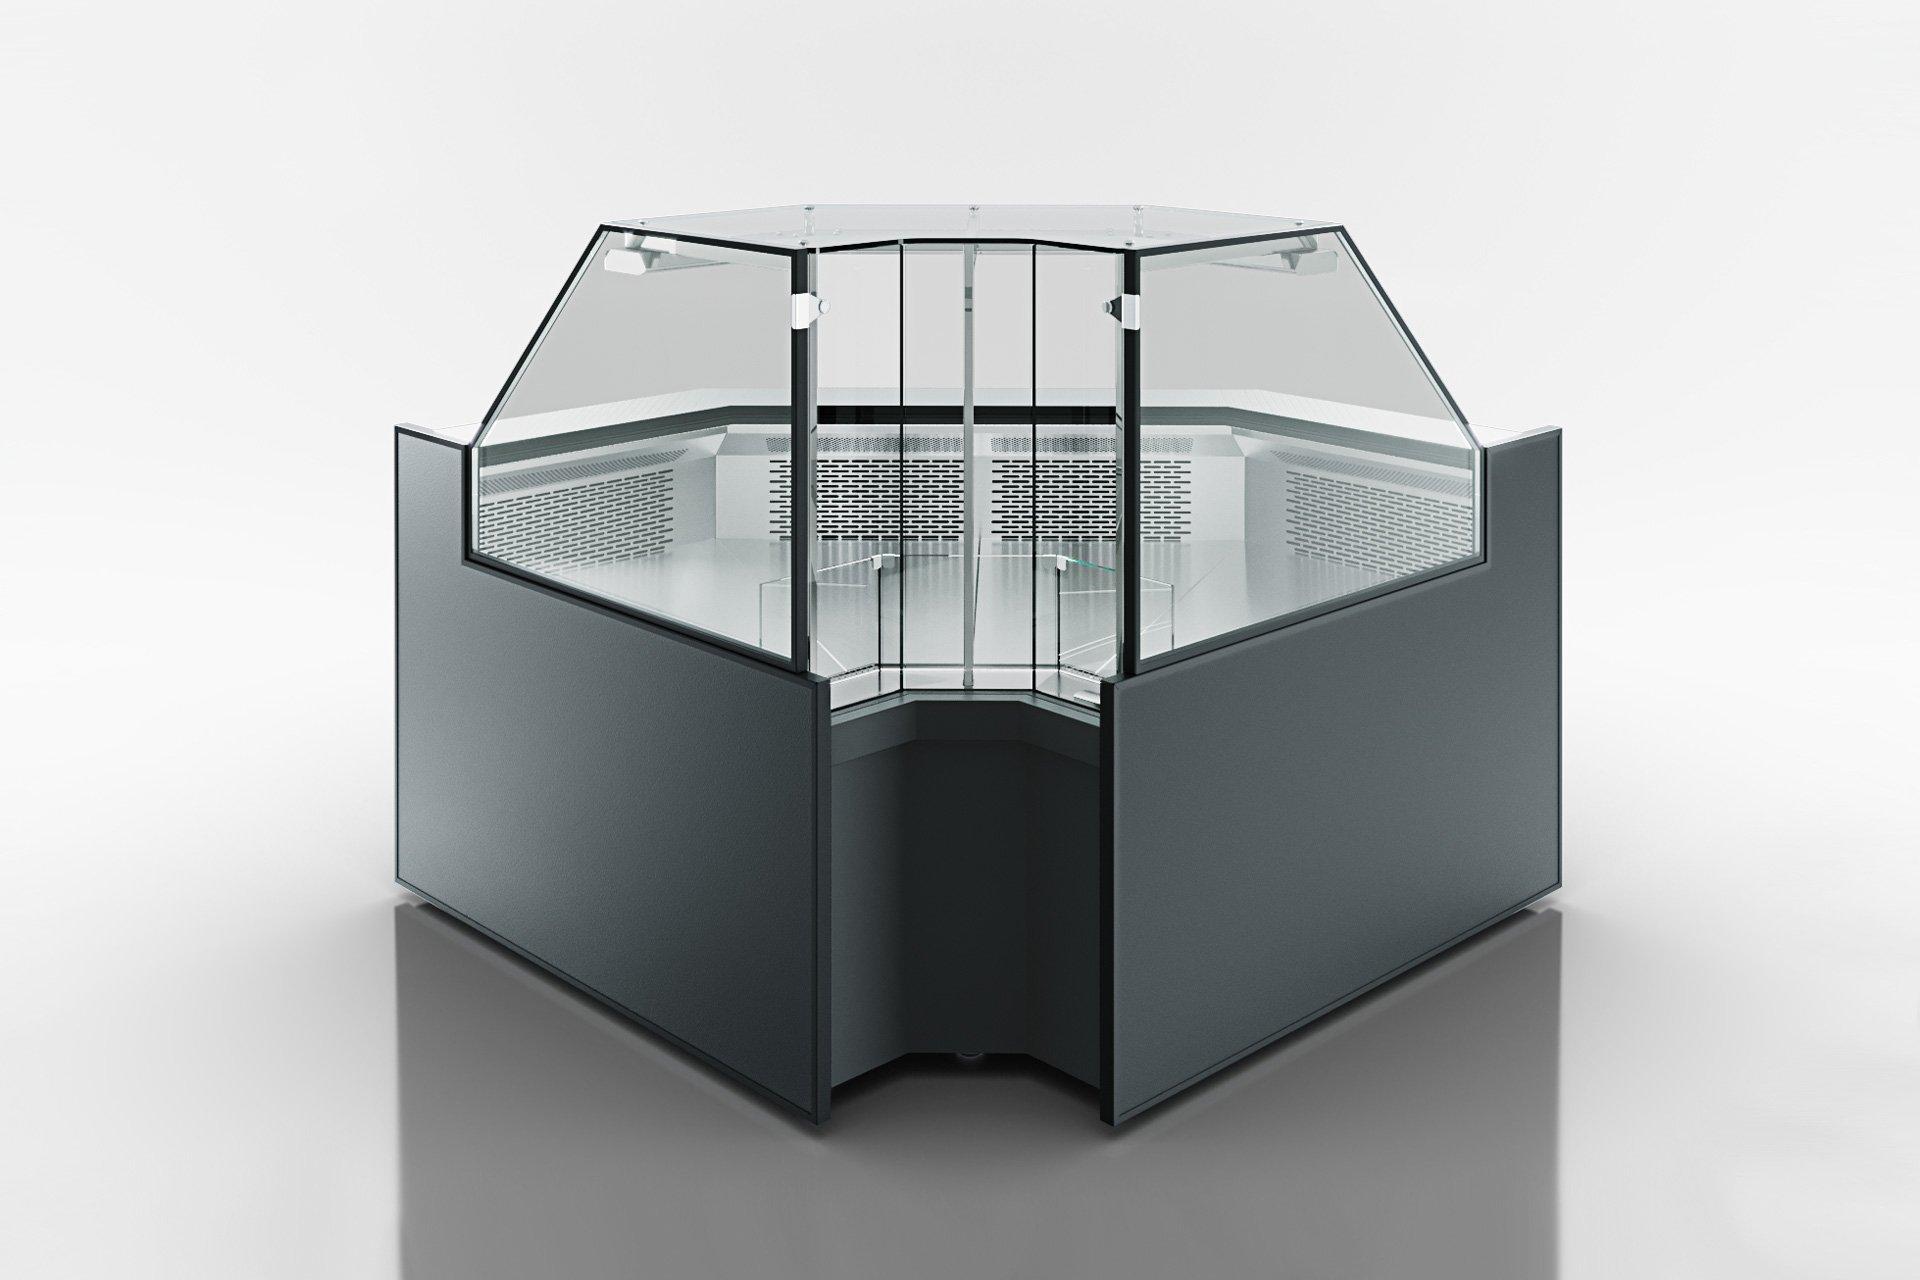 Angular elements of refrigerating counters Missouri MC 120 deli PP 130-DLM-IS90